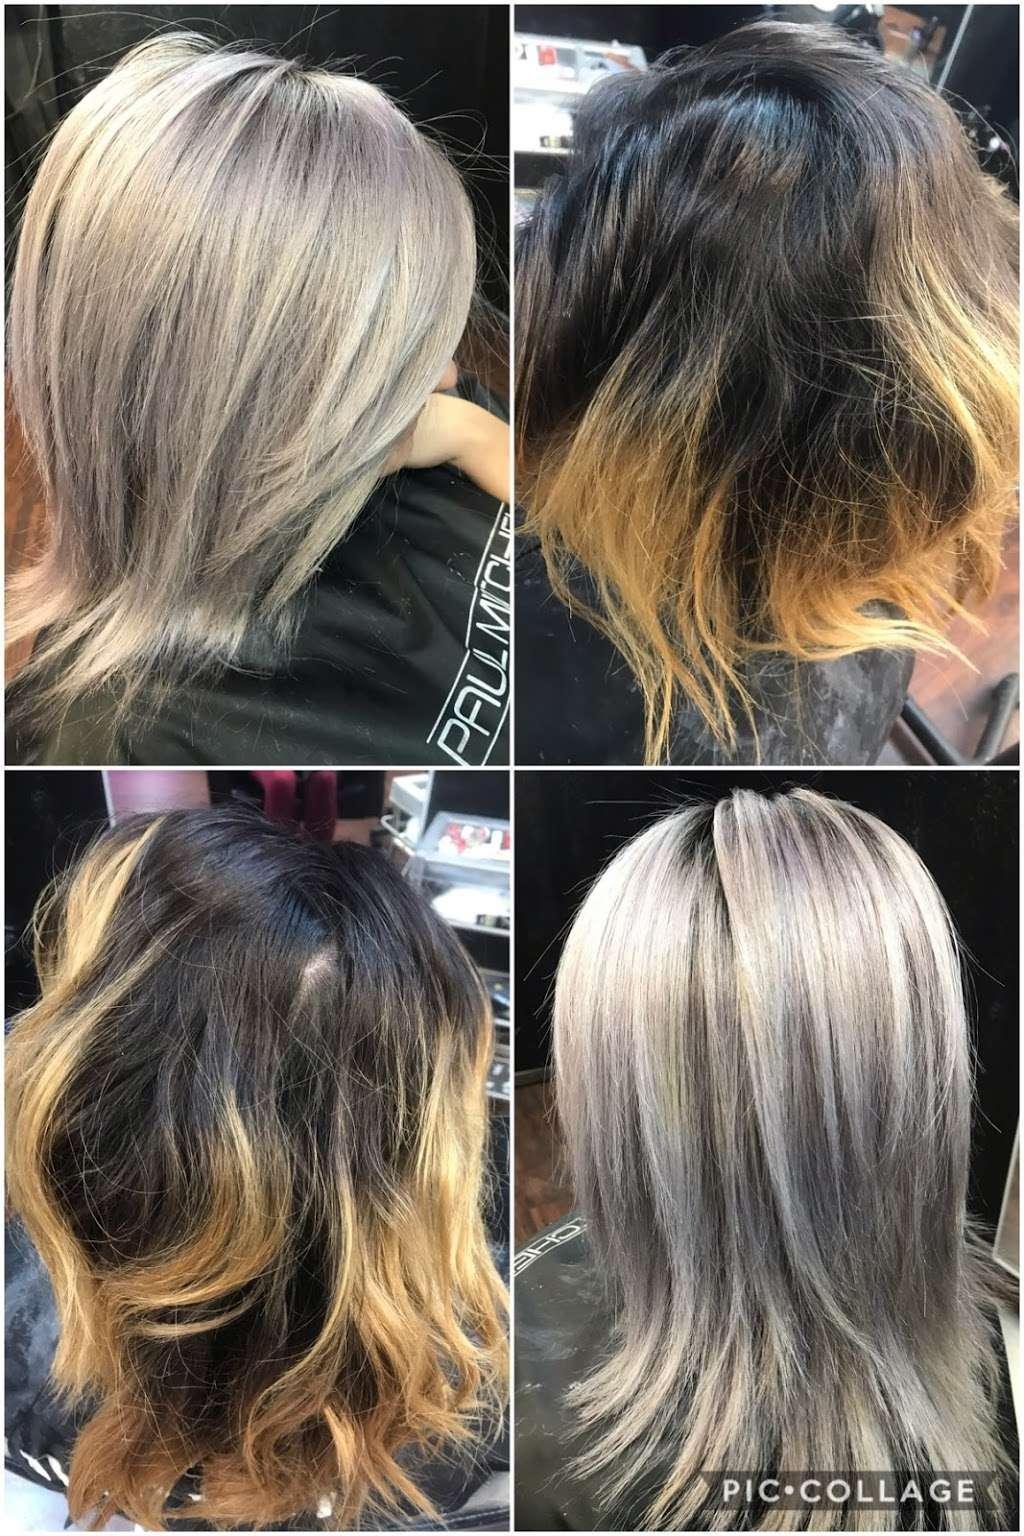 Jan Fher Hair Designer studio - hair care    Photo 2 of 10   Address: 842 S Galloway Ave, Mesquite, TX 75149, USA   Phone: (972) 322-9373